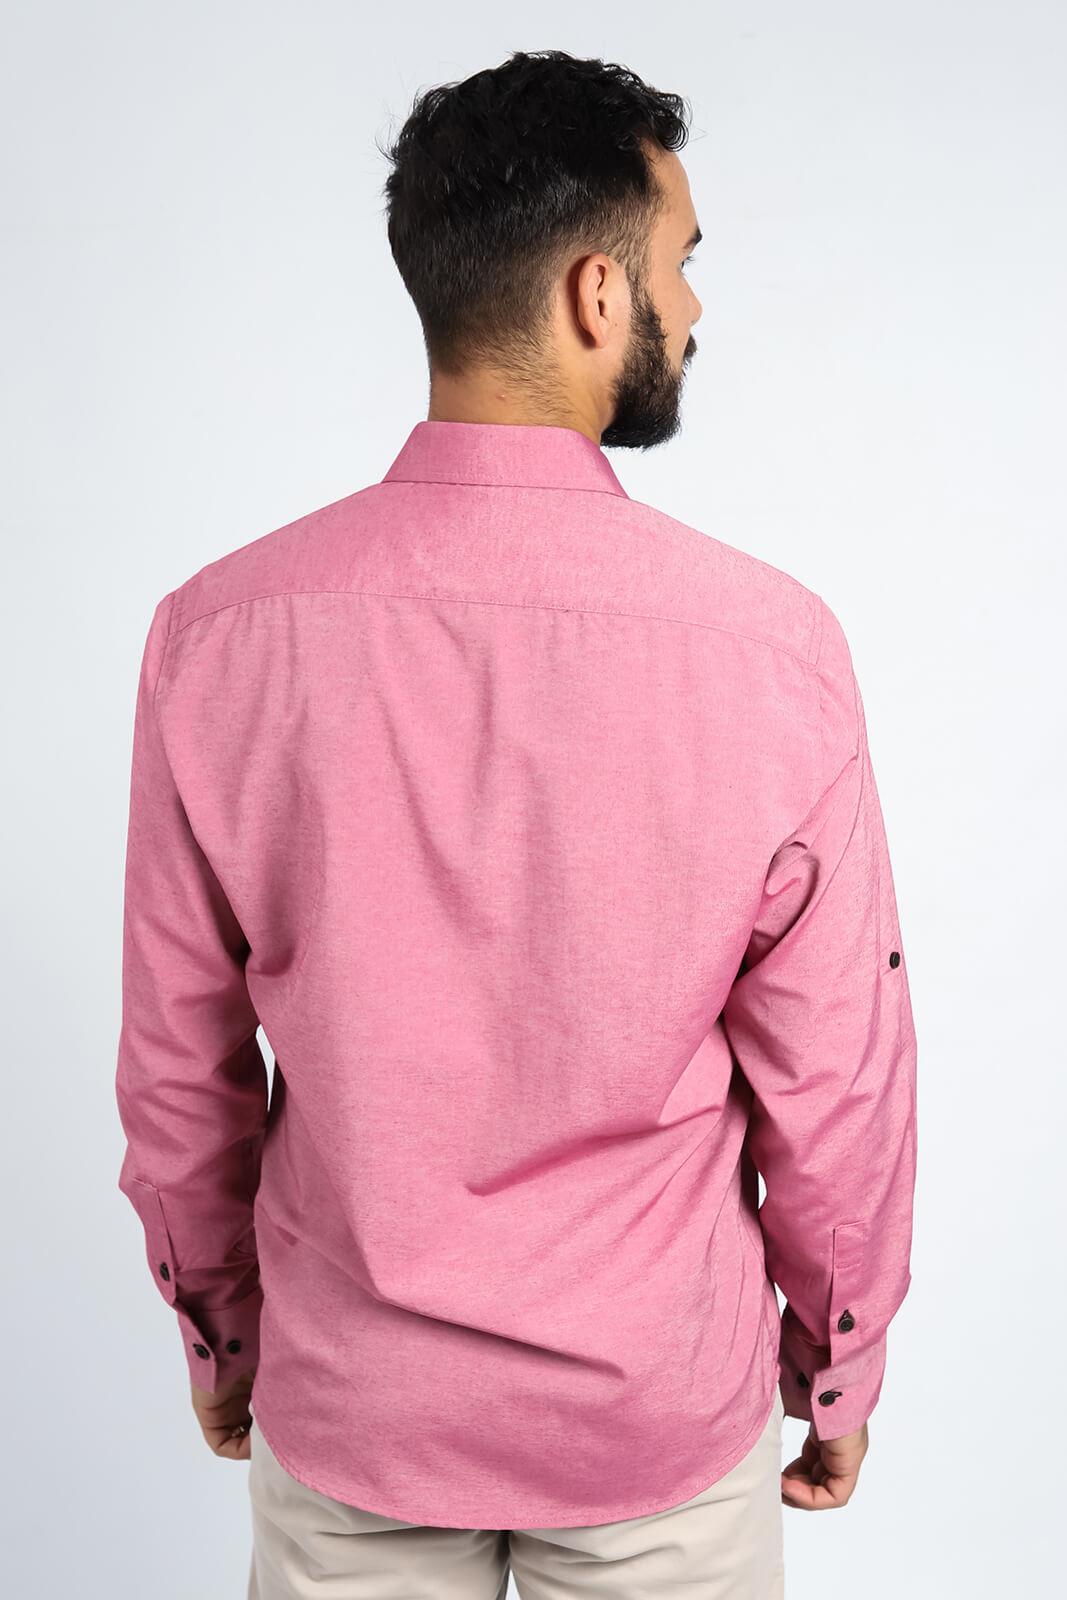 Camisa Social Masculina Slim Olimpo Chambray Liso com Bolso Manga Longa